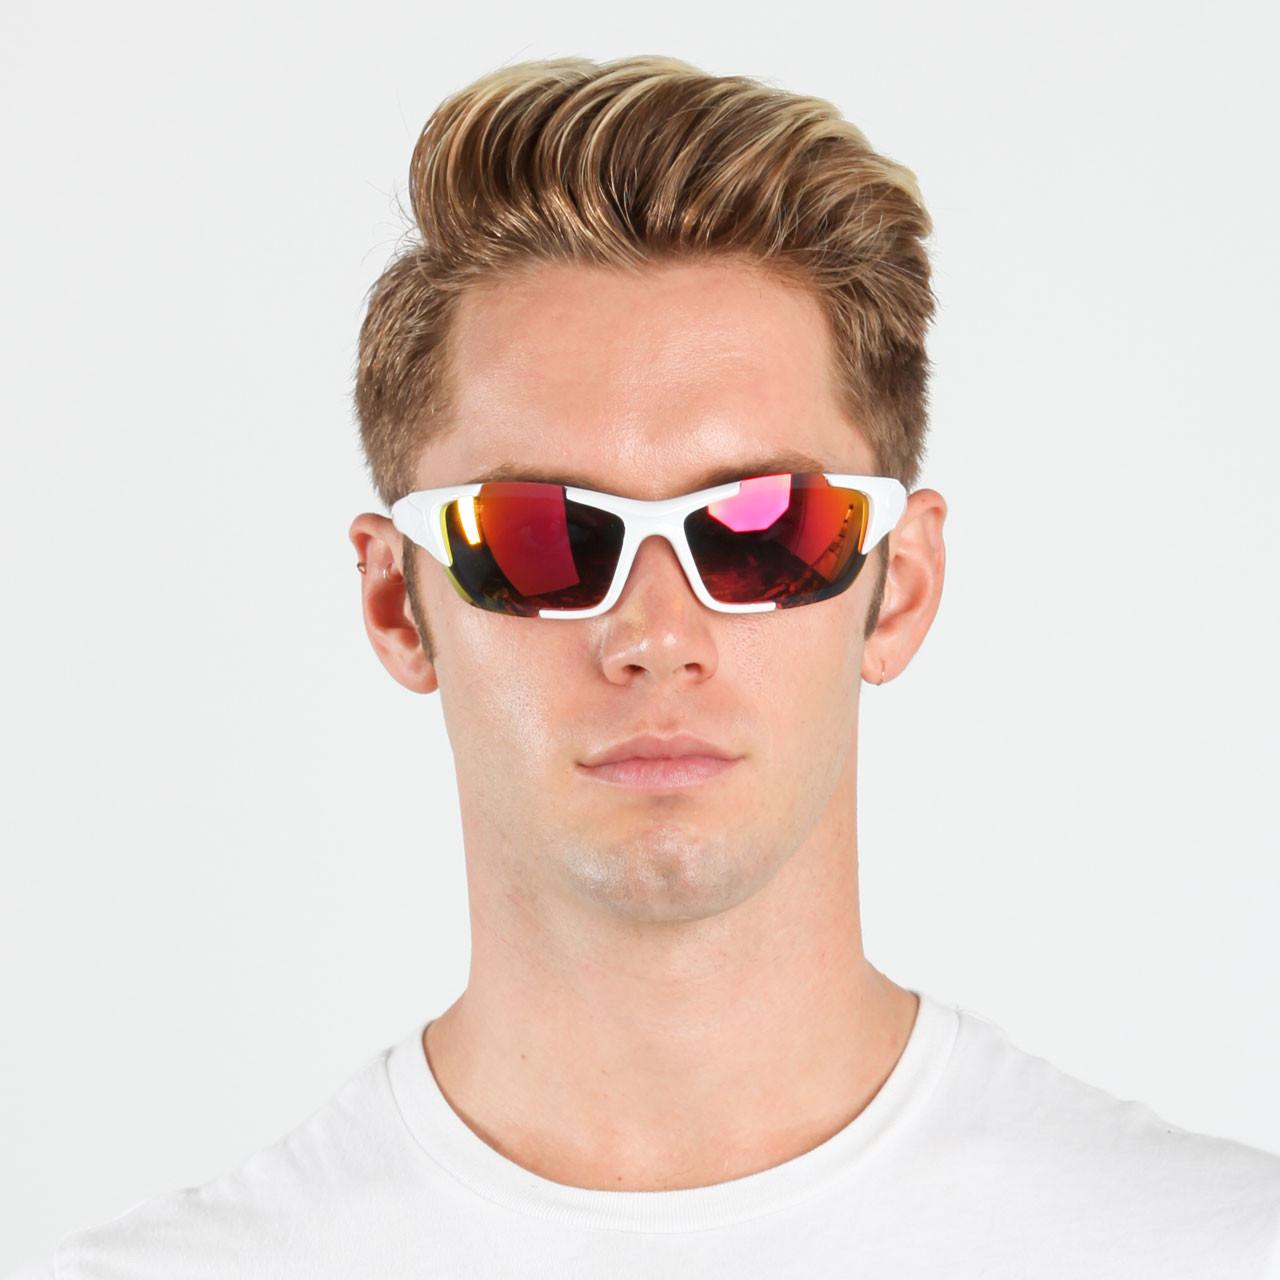 743e9e44a11e Wholesale Assorted Colors Plastic UV400 Sport Wrap Sunglasses Mens Bulk | 1  Dozen with Tags | RXS05. Racer X